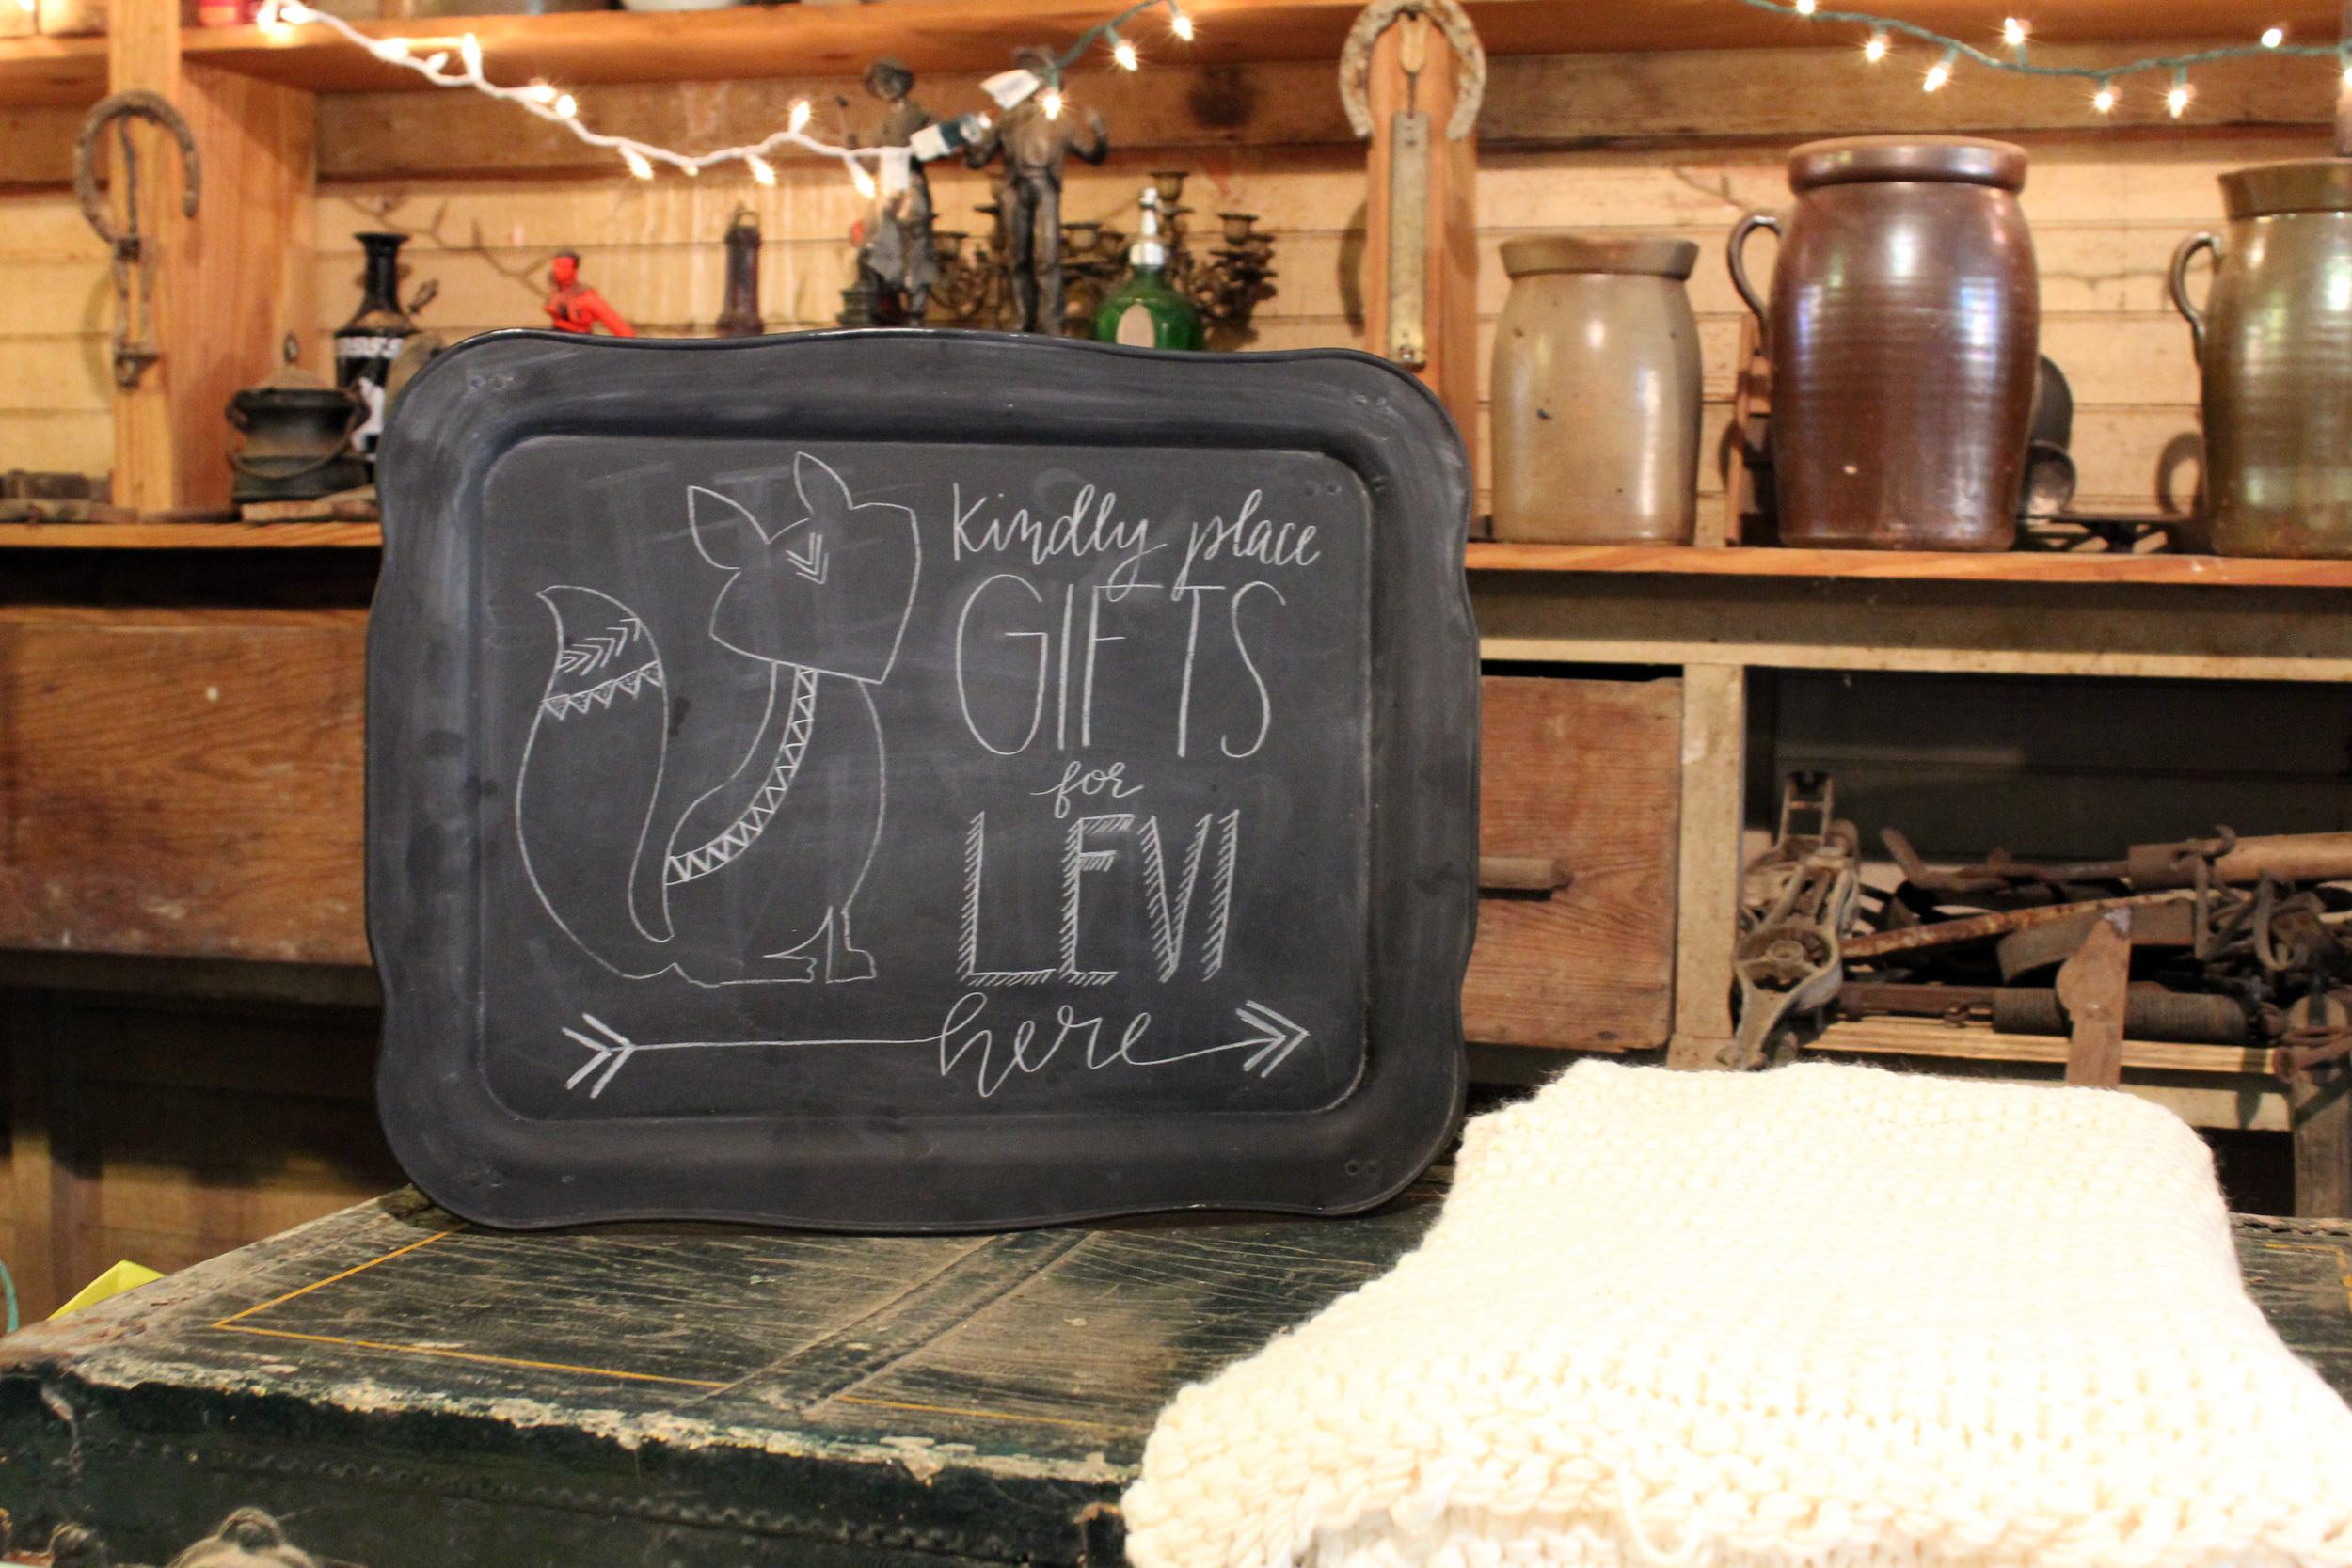 Baby Shower Gifts Sign Chalkboard via Jitney's Journeys